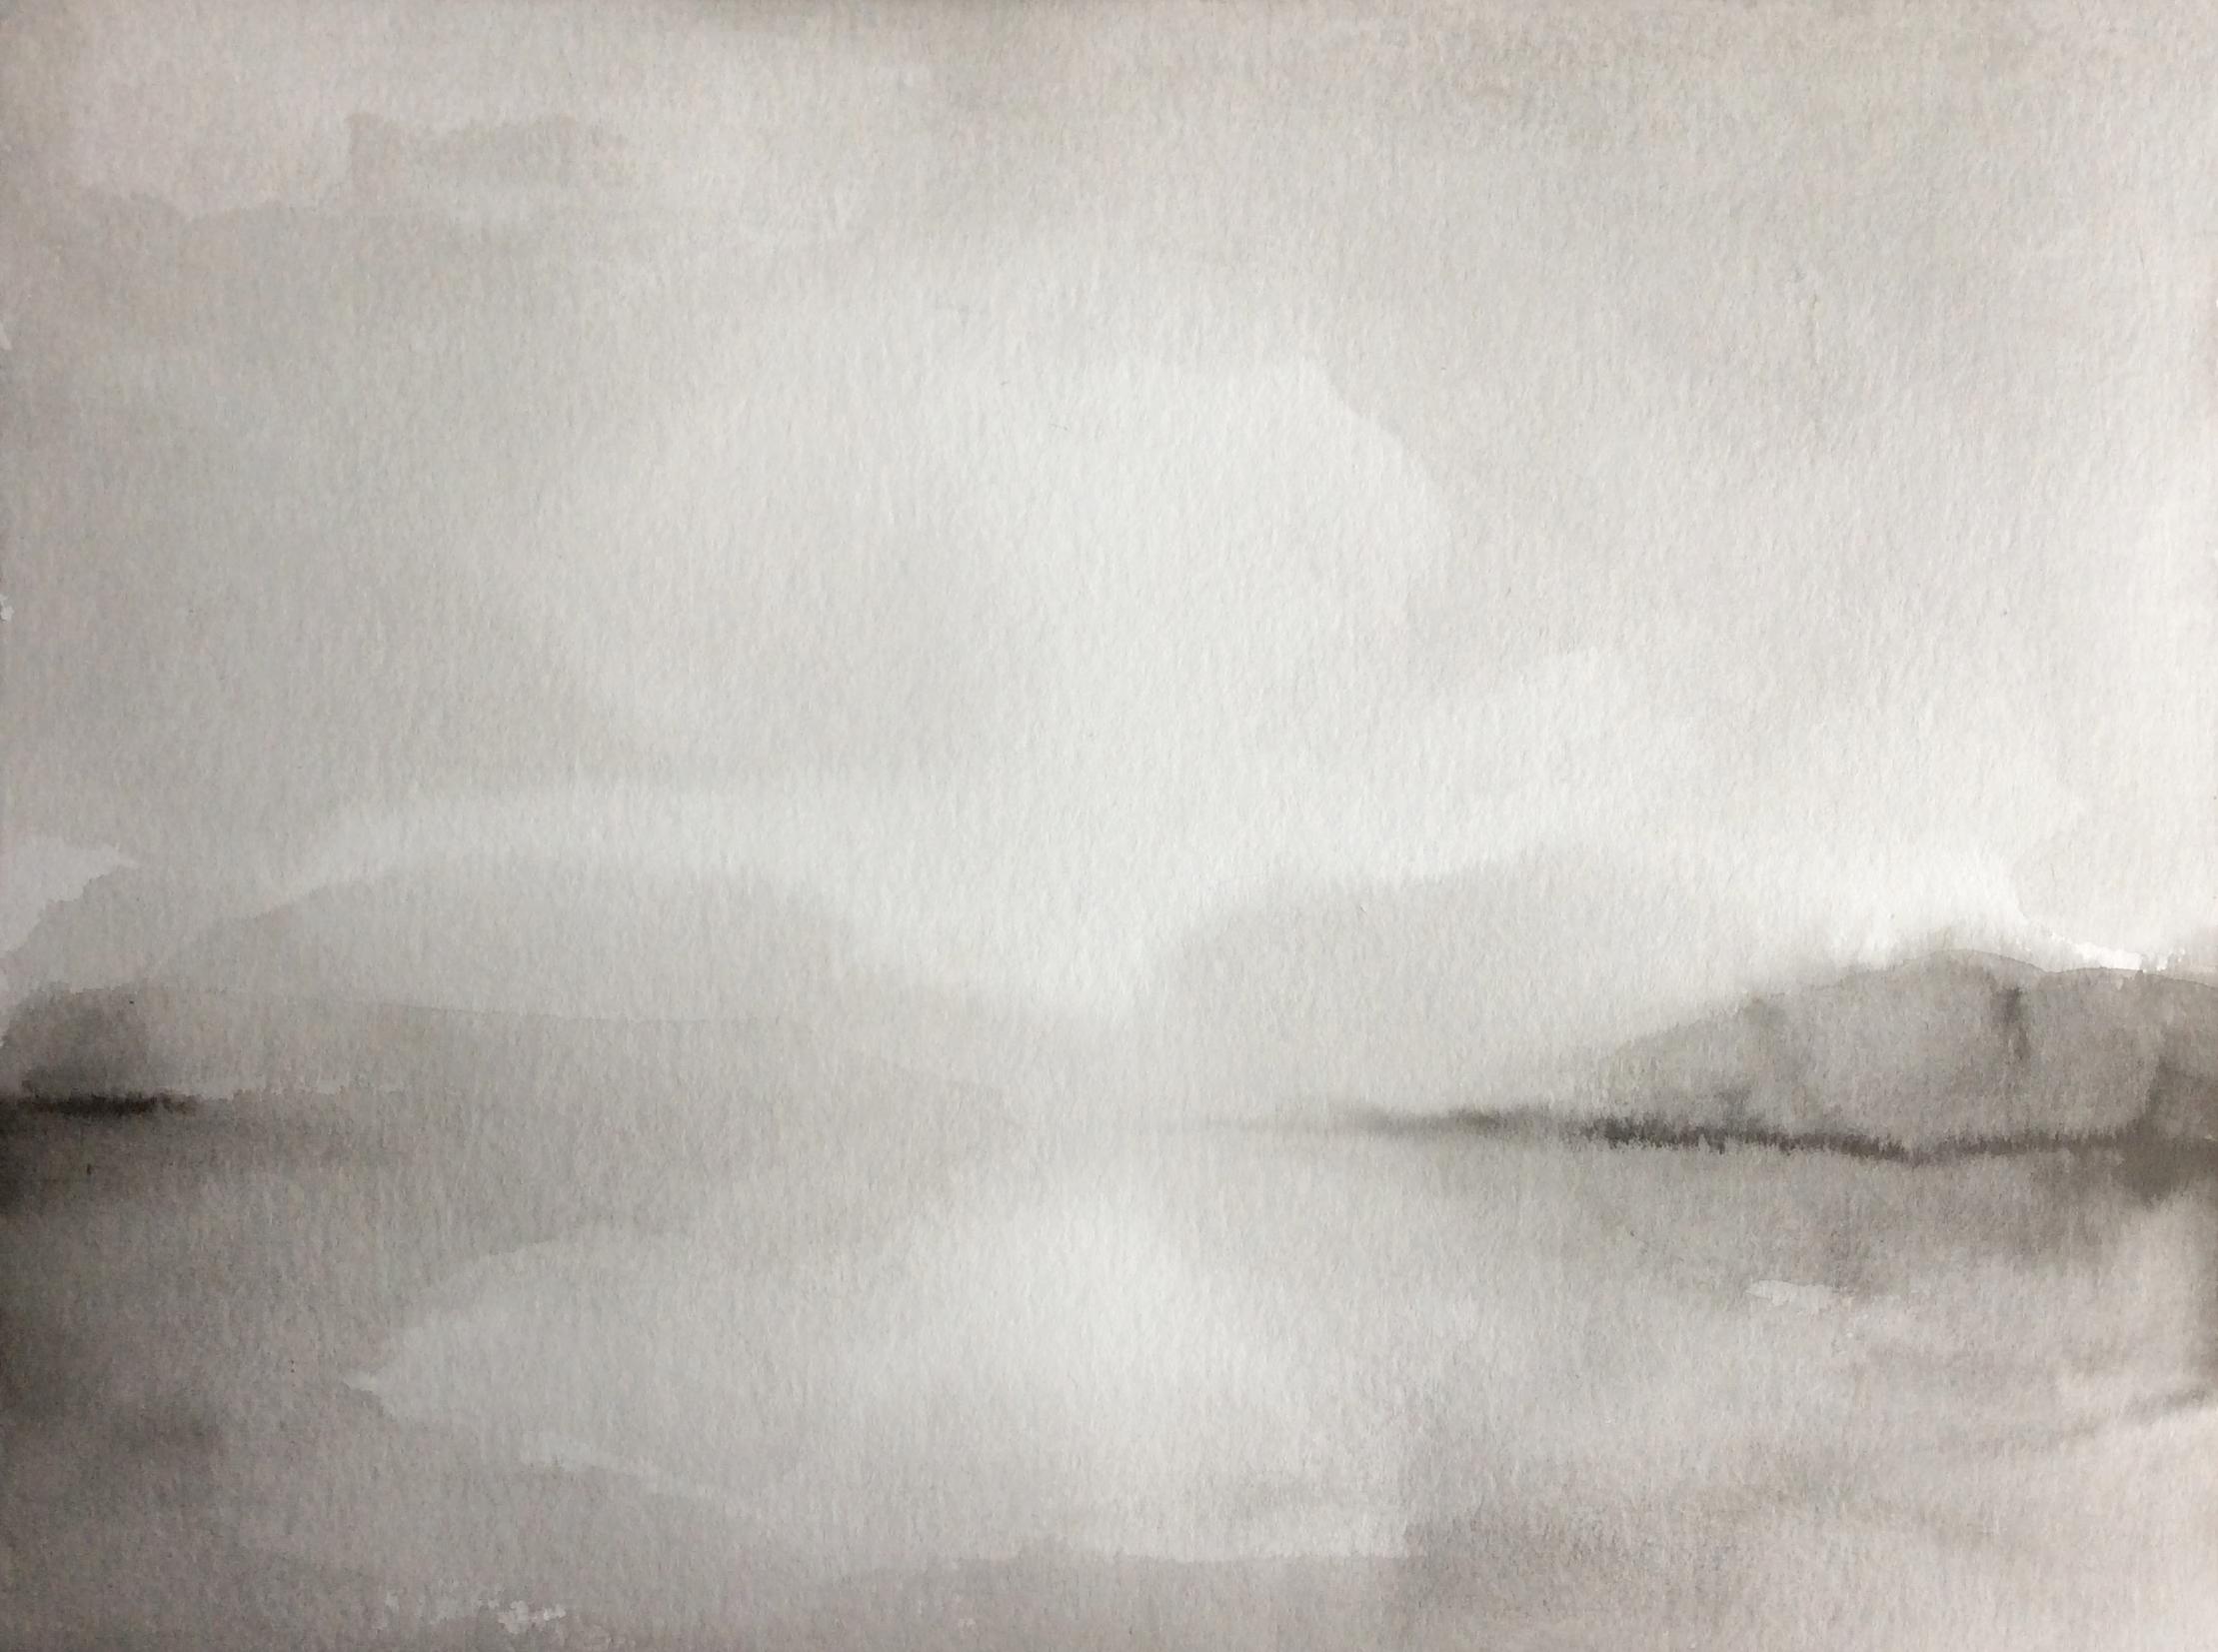 On the Vistula Riber, 30x40cm, ink, paper, 2020